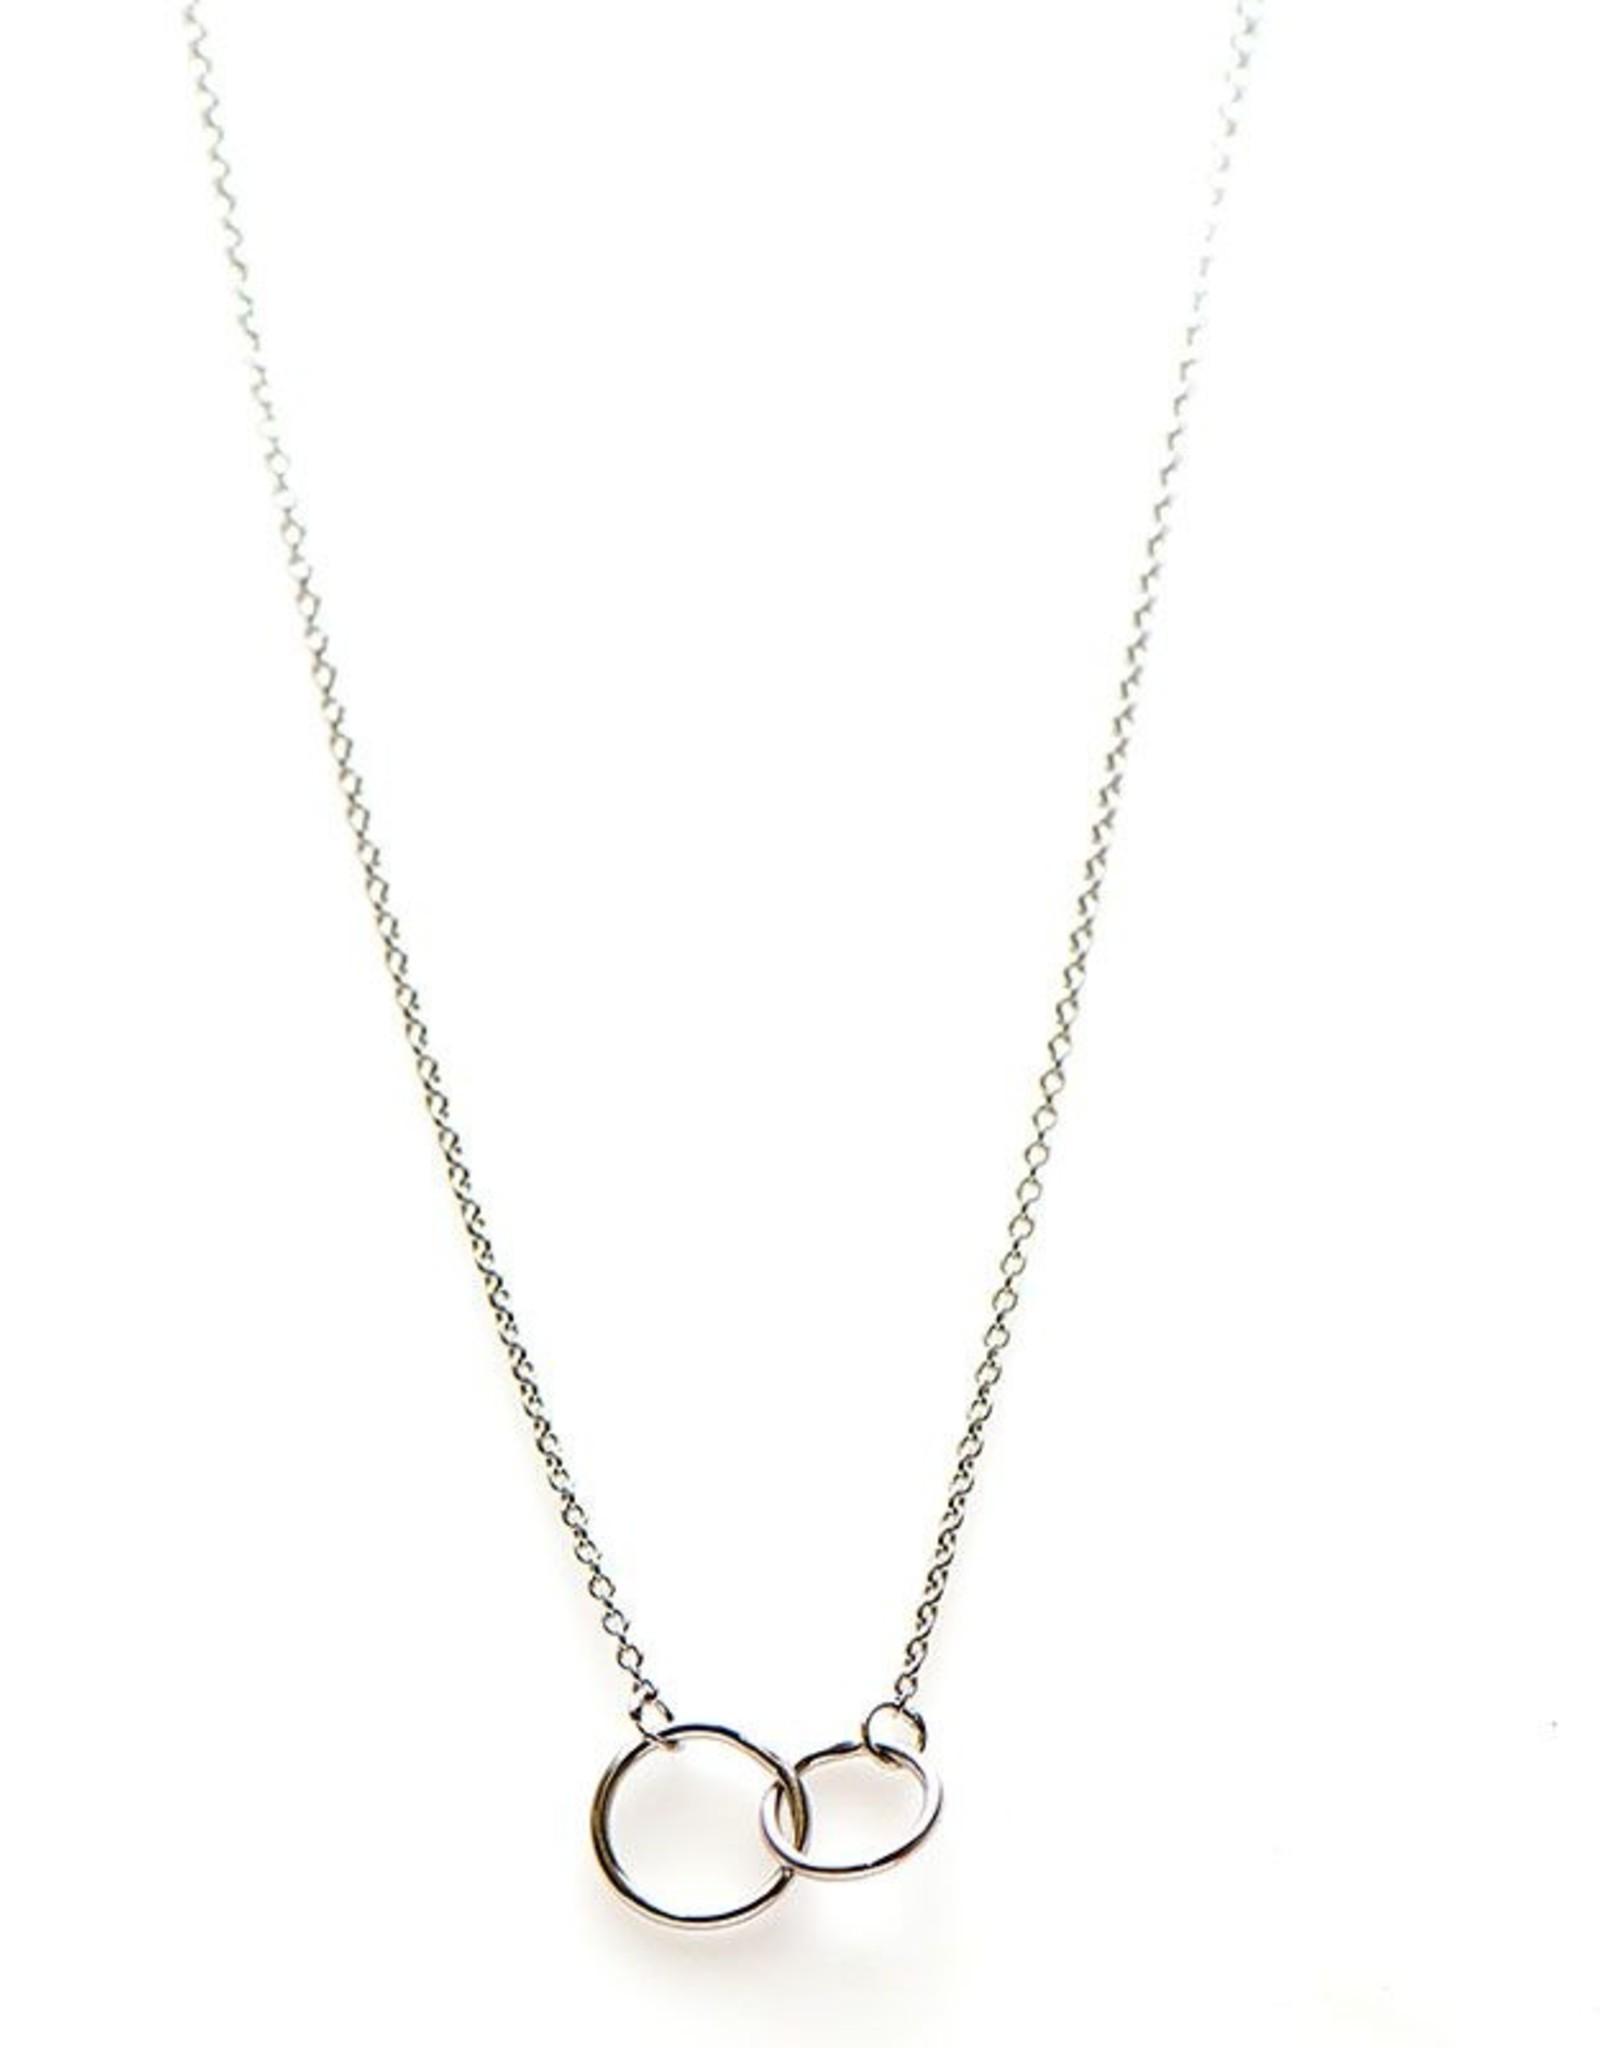 Karma Necklace Double Circle Silver